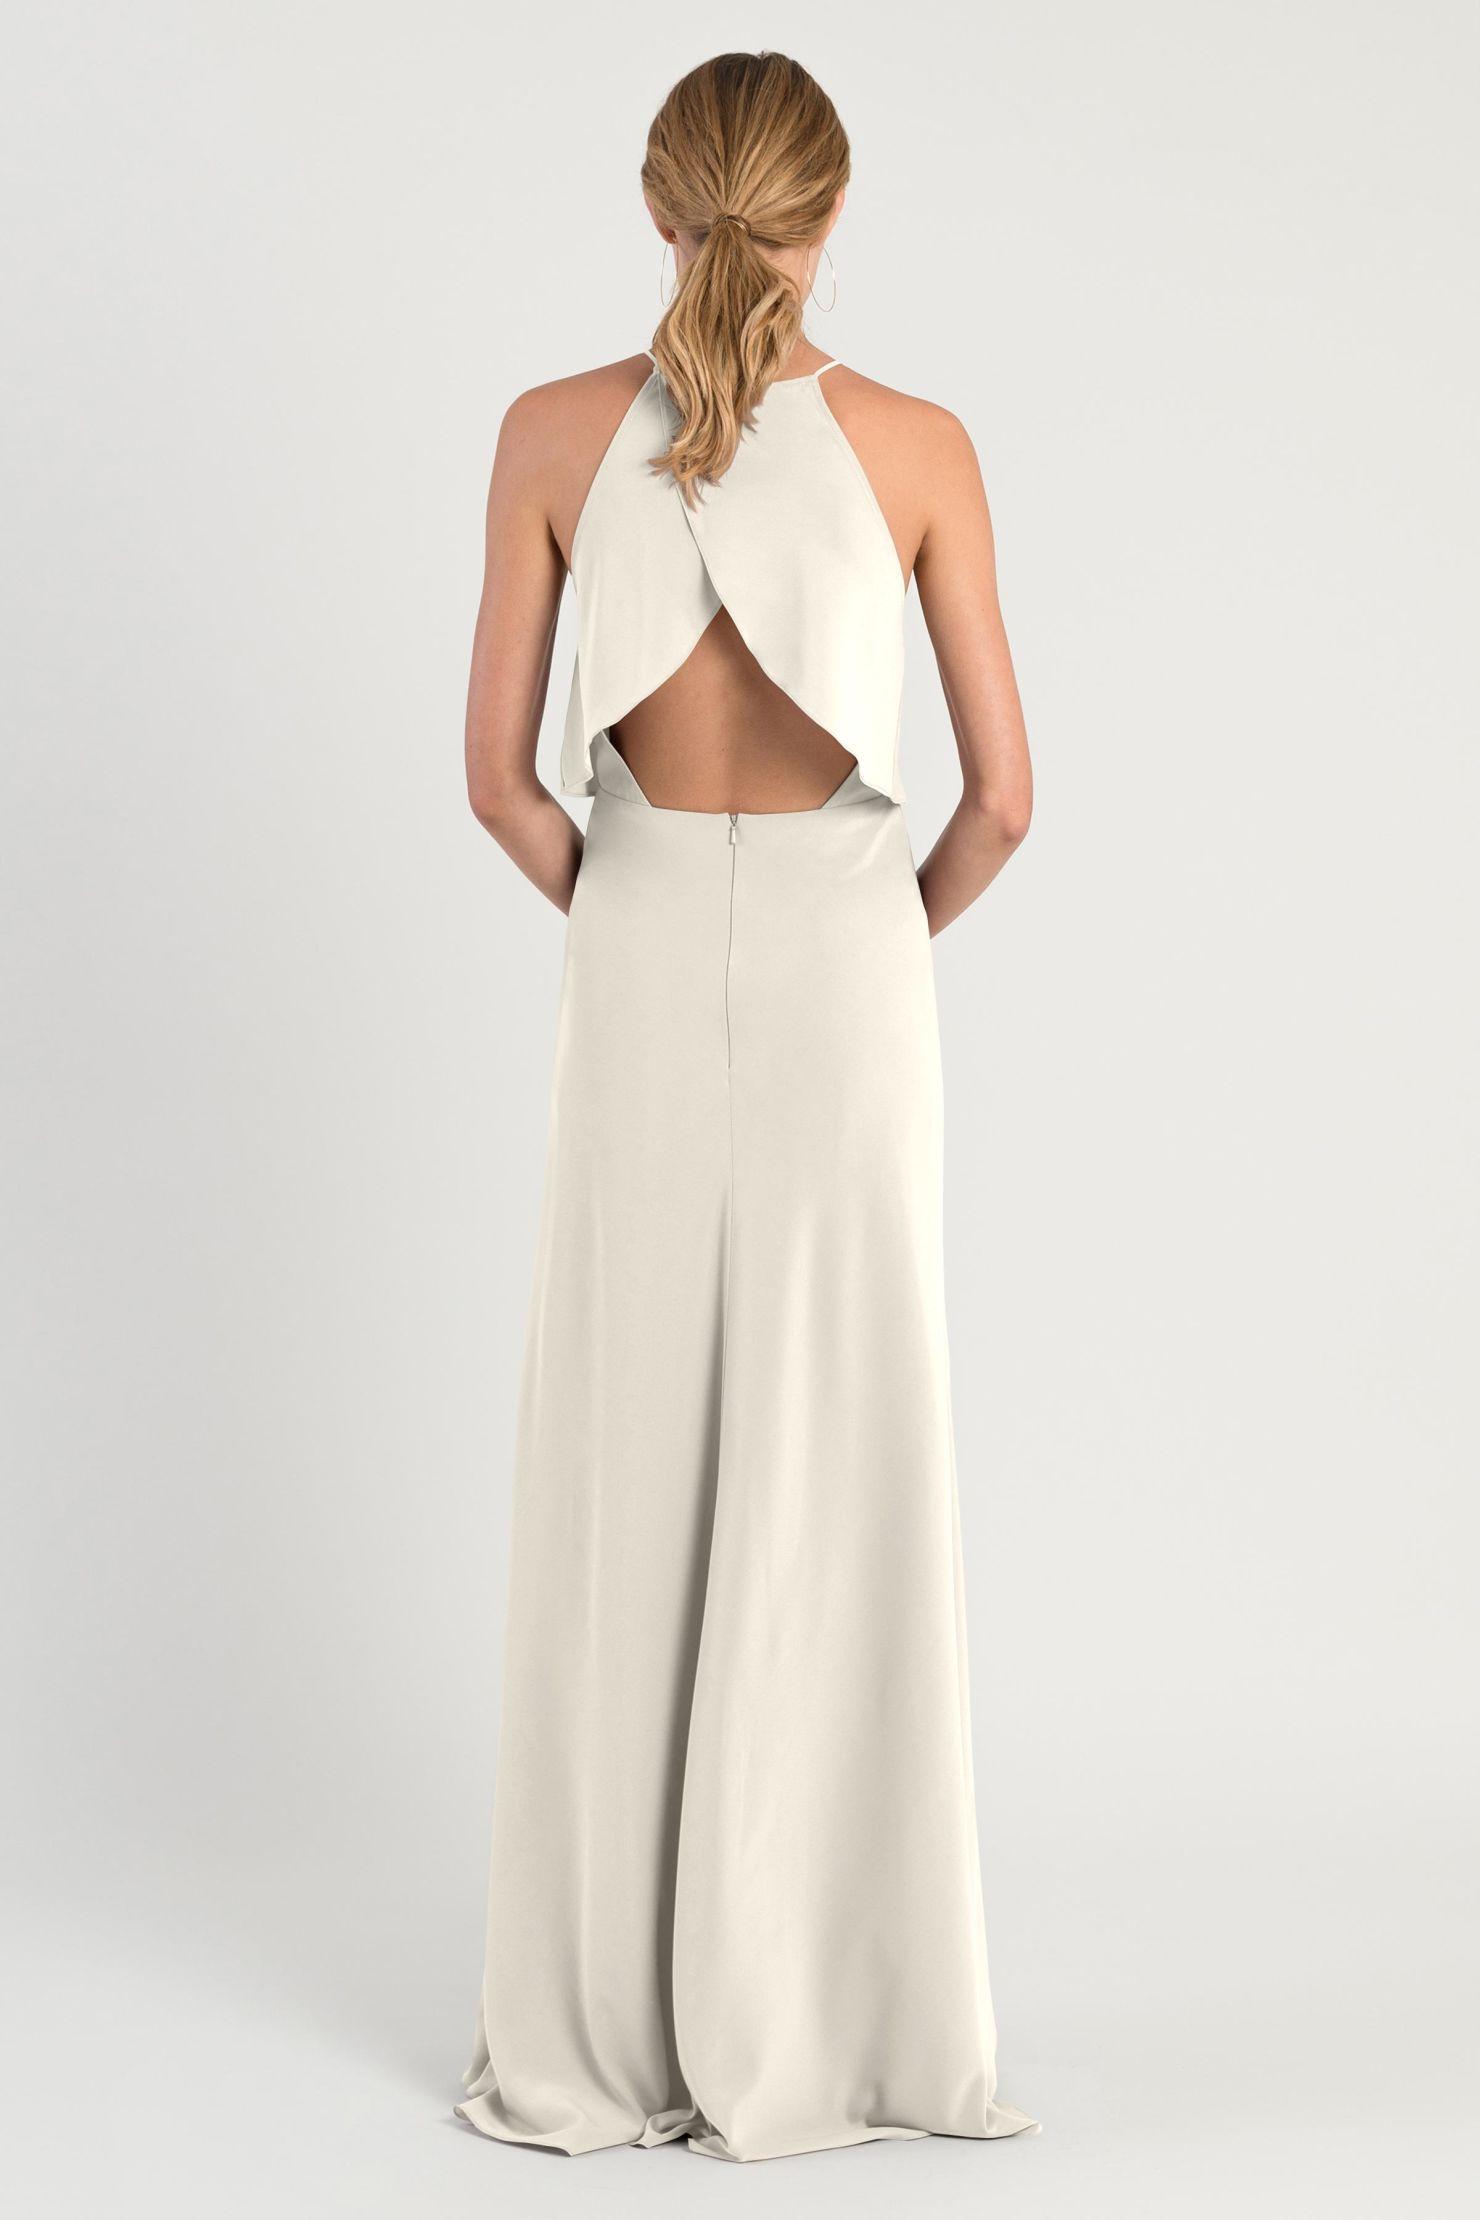 Elle Bridesmaids Dress by Jenny Yoo - Ivory